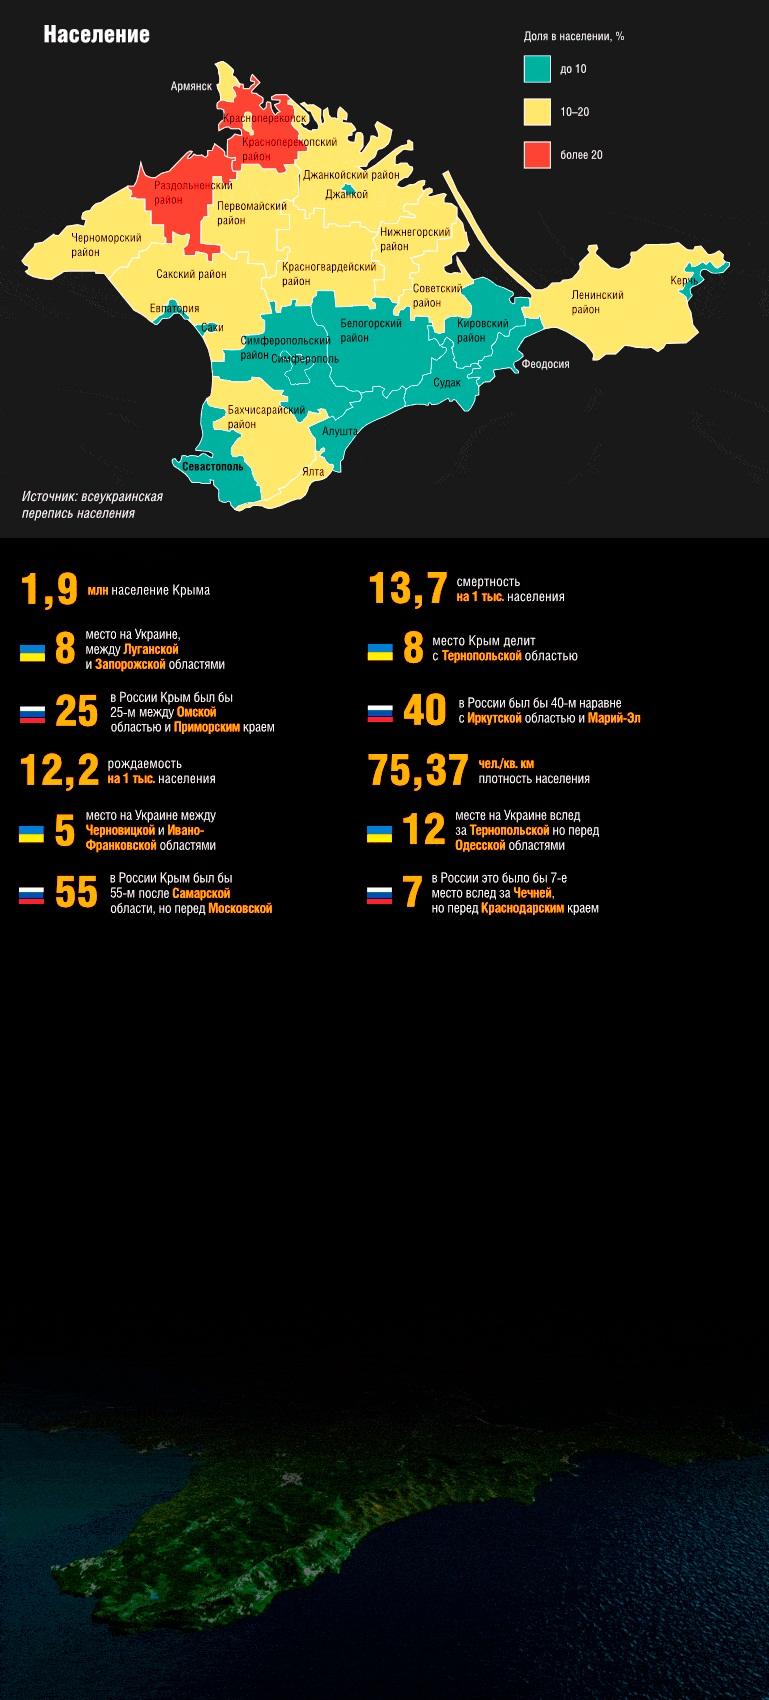 Crimea_map_data_2014_03_17_Kommersant_4_language_Ukrainian_Kommersant